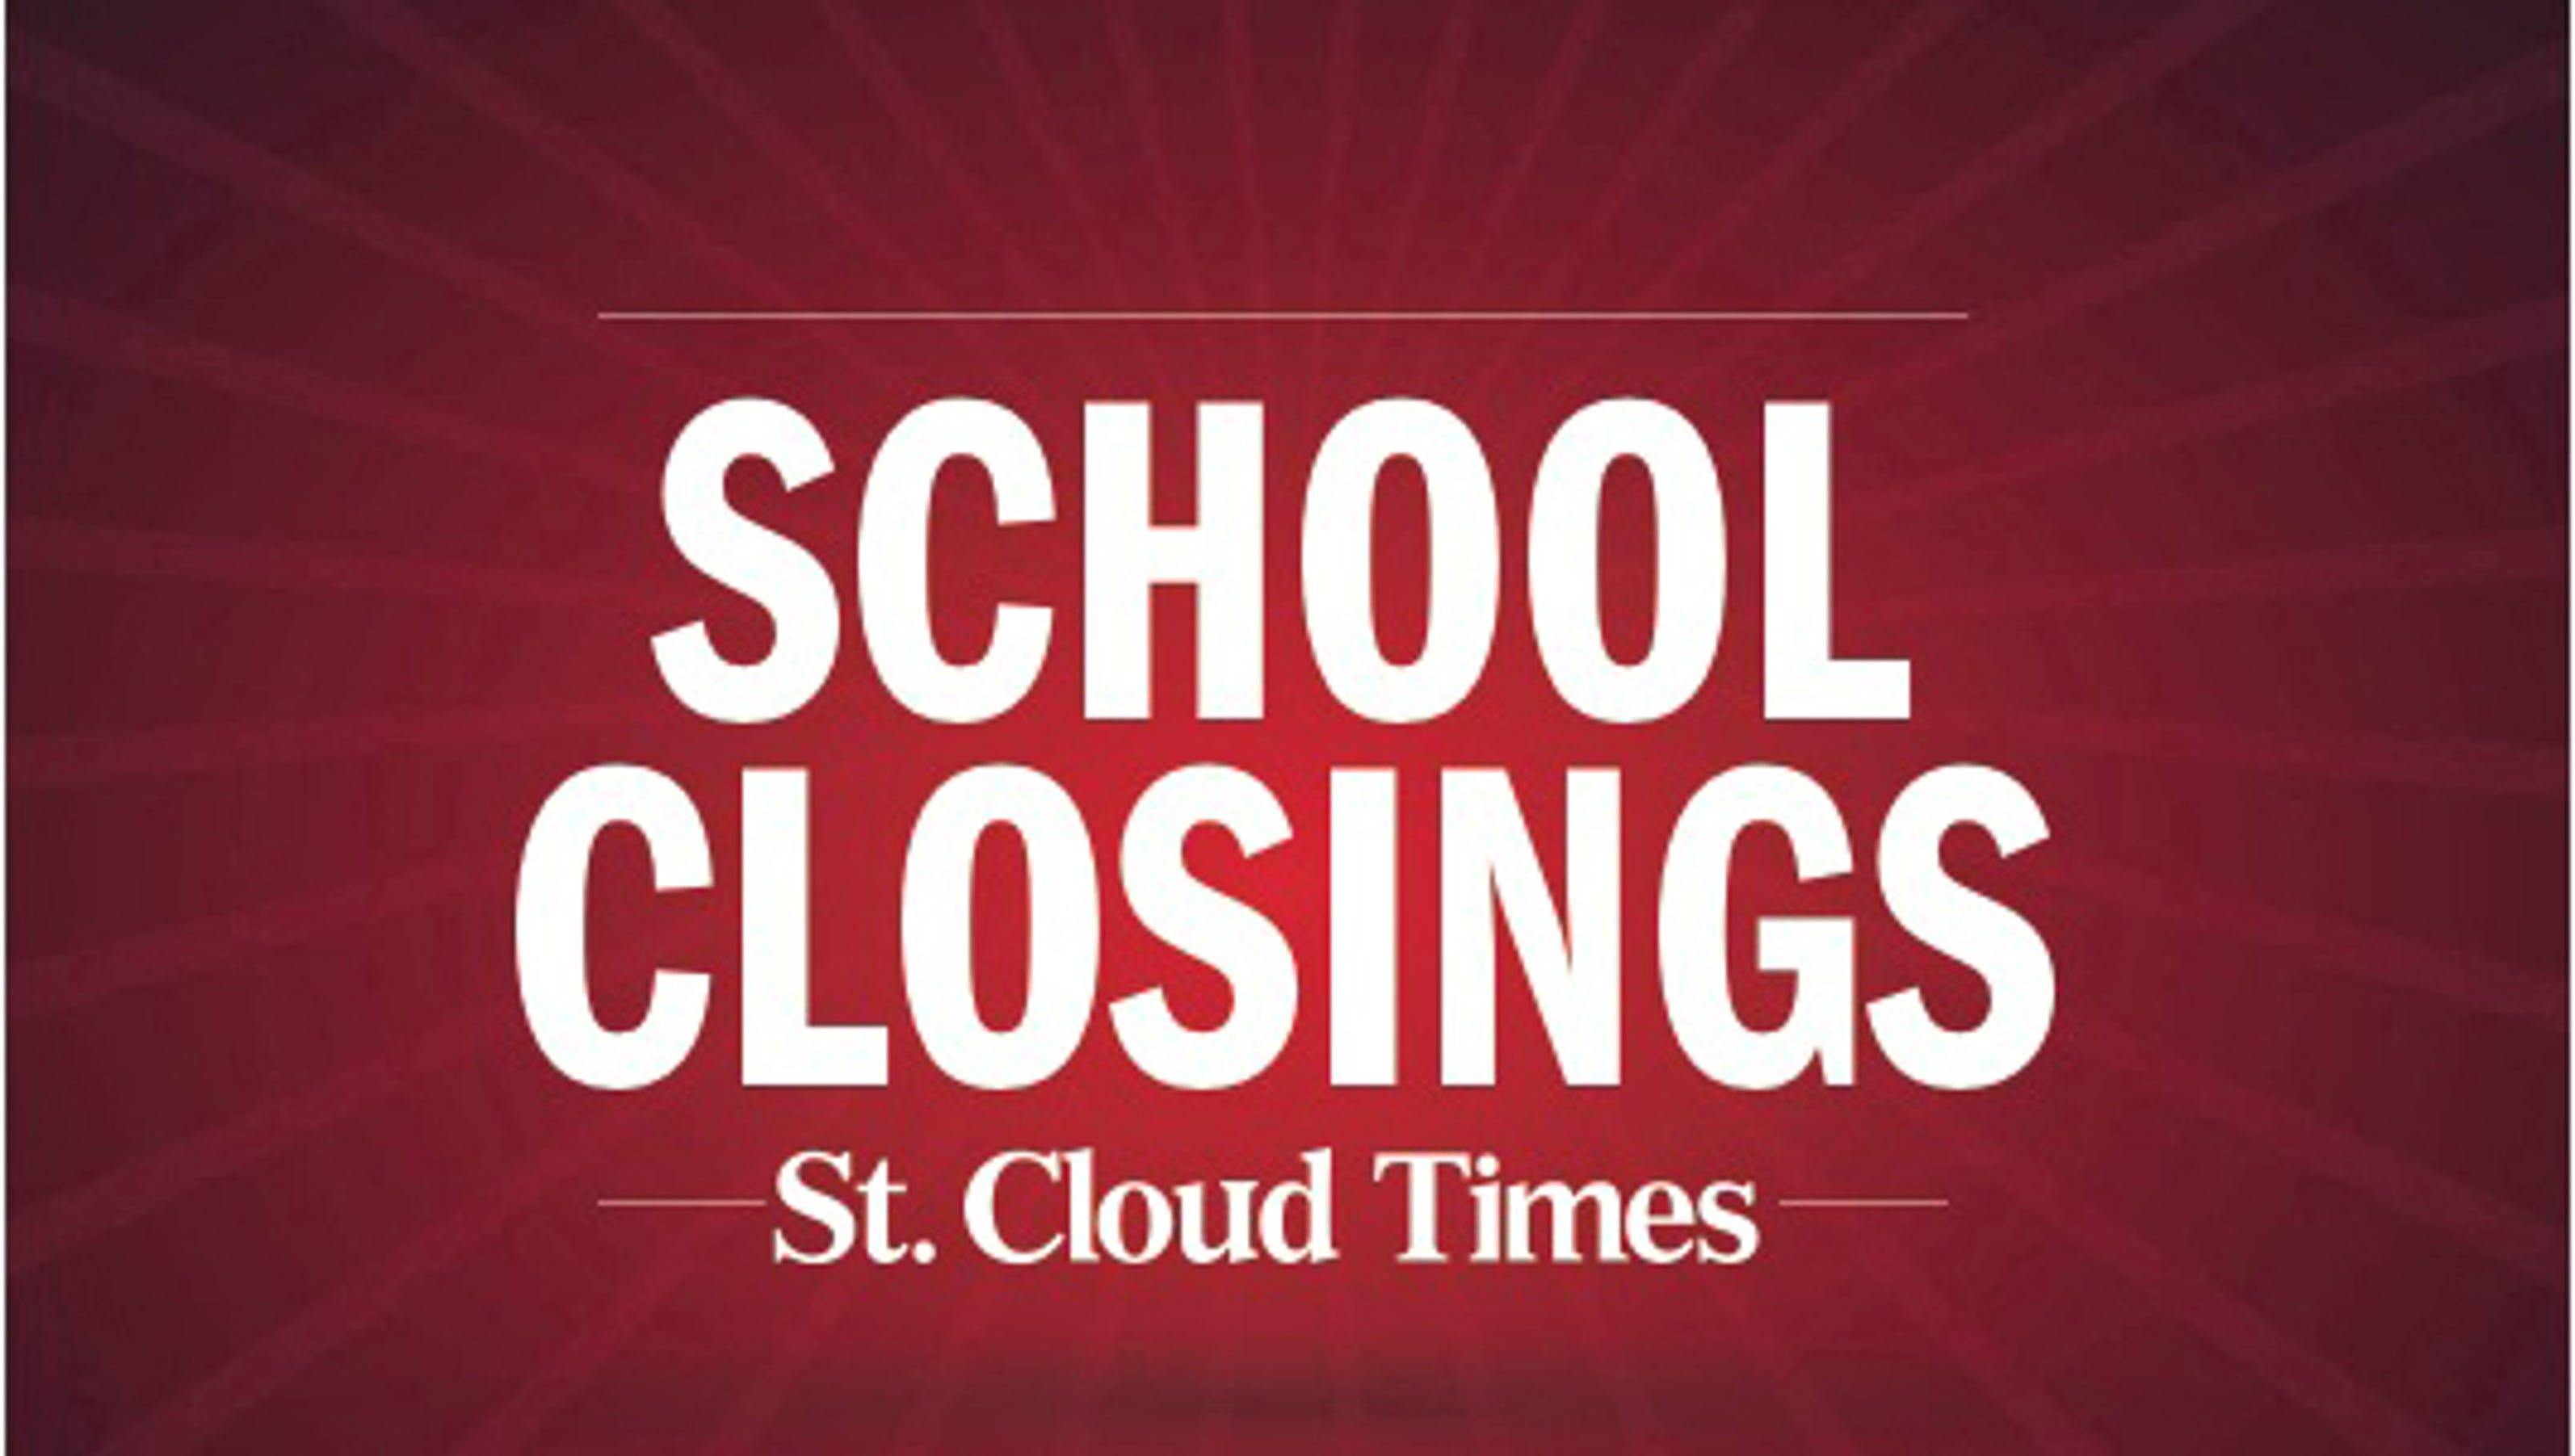 school closings - photo #23